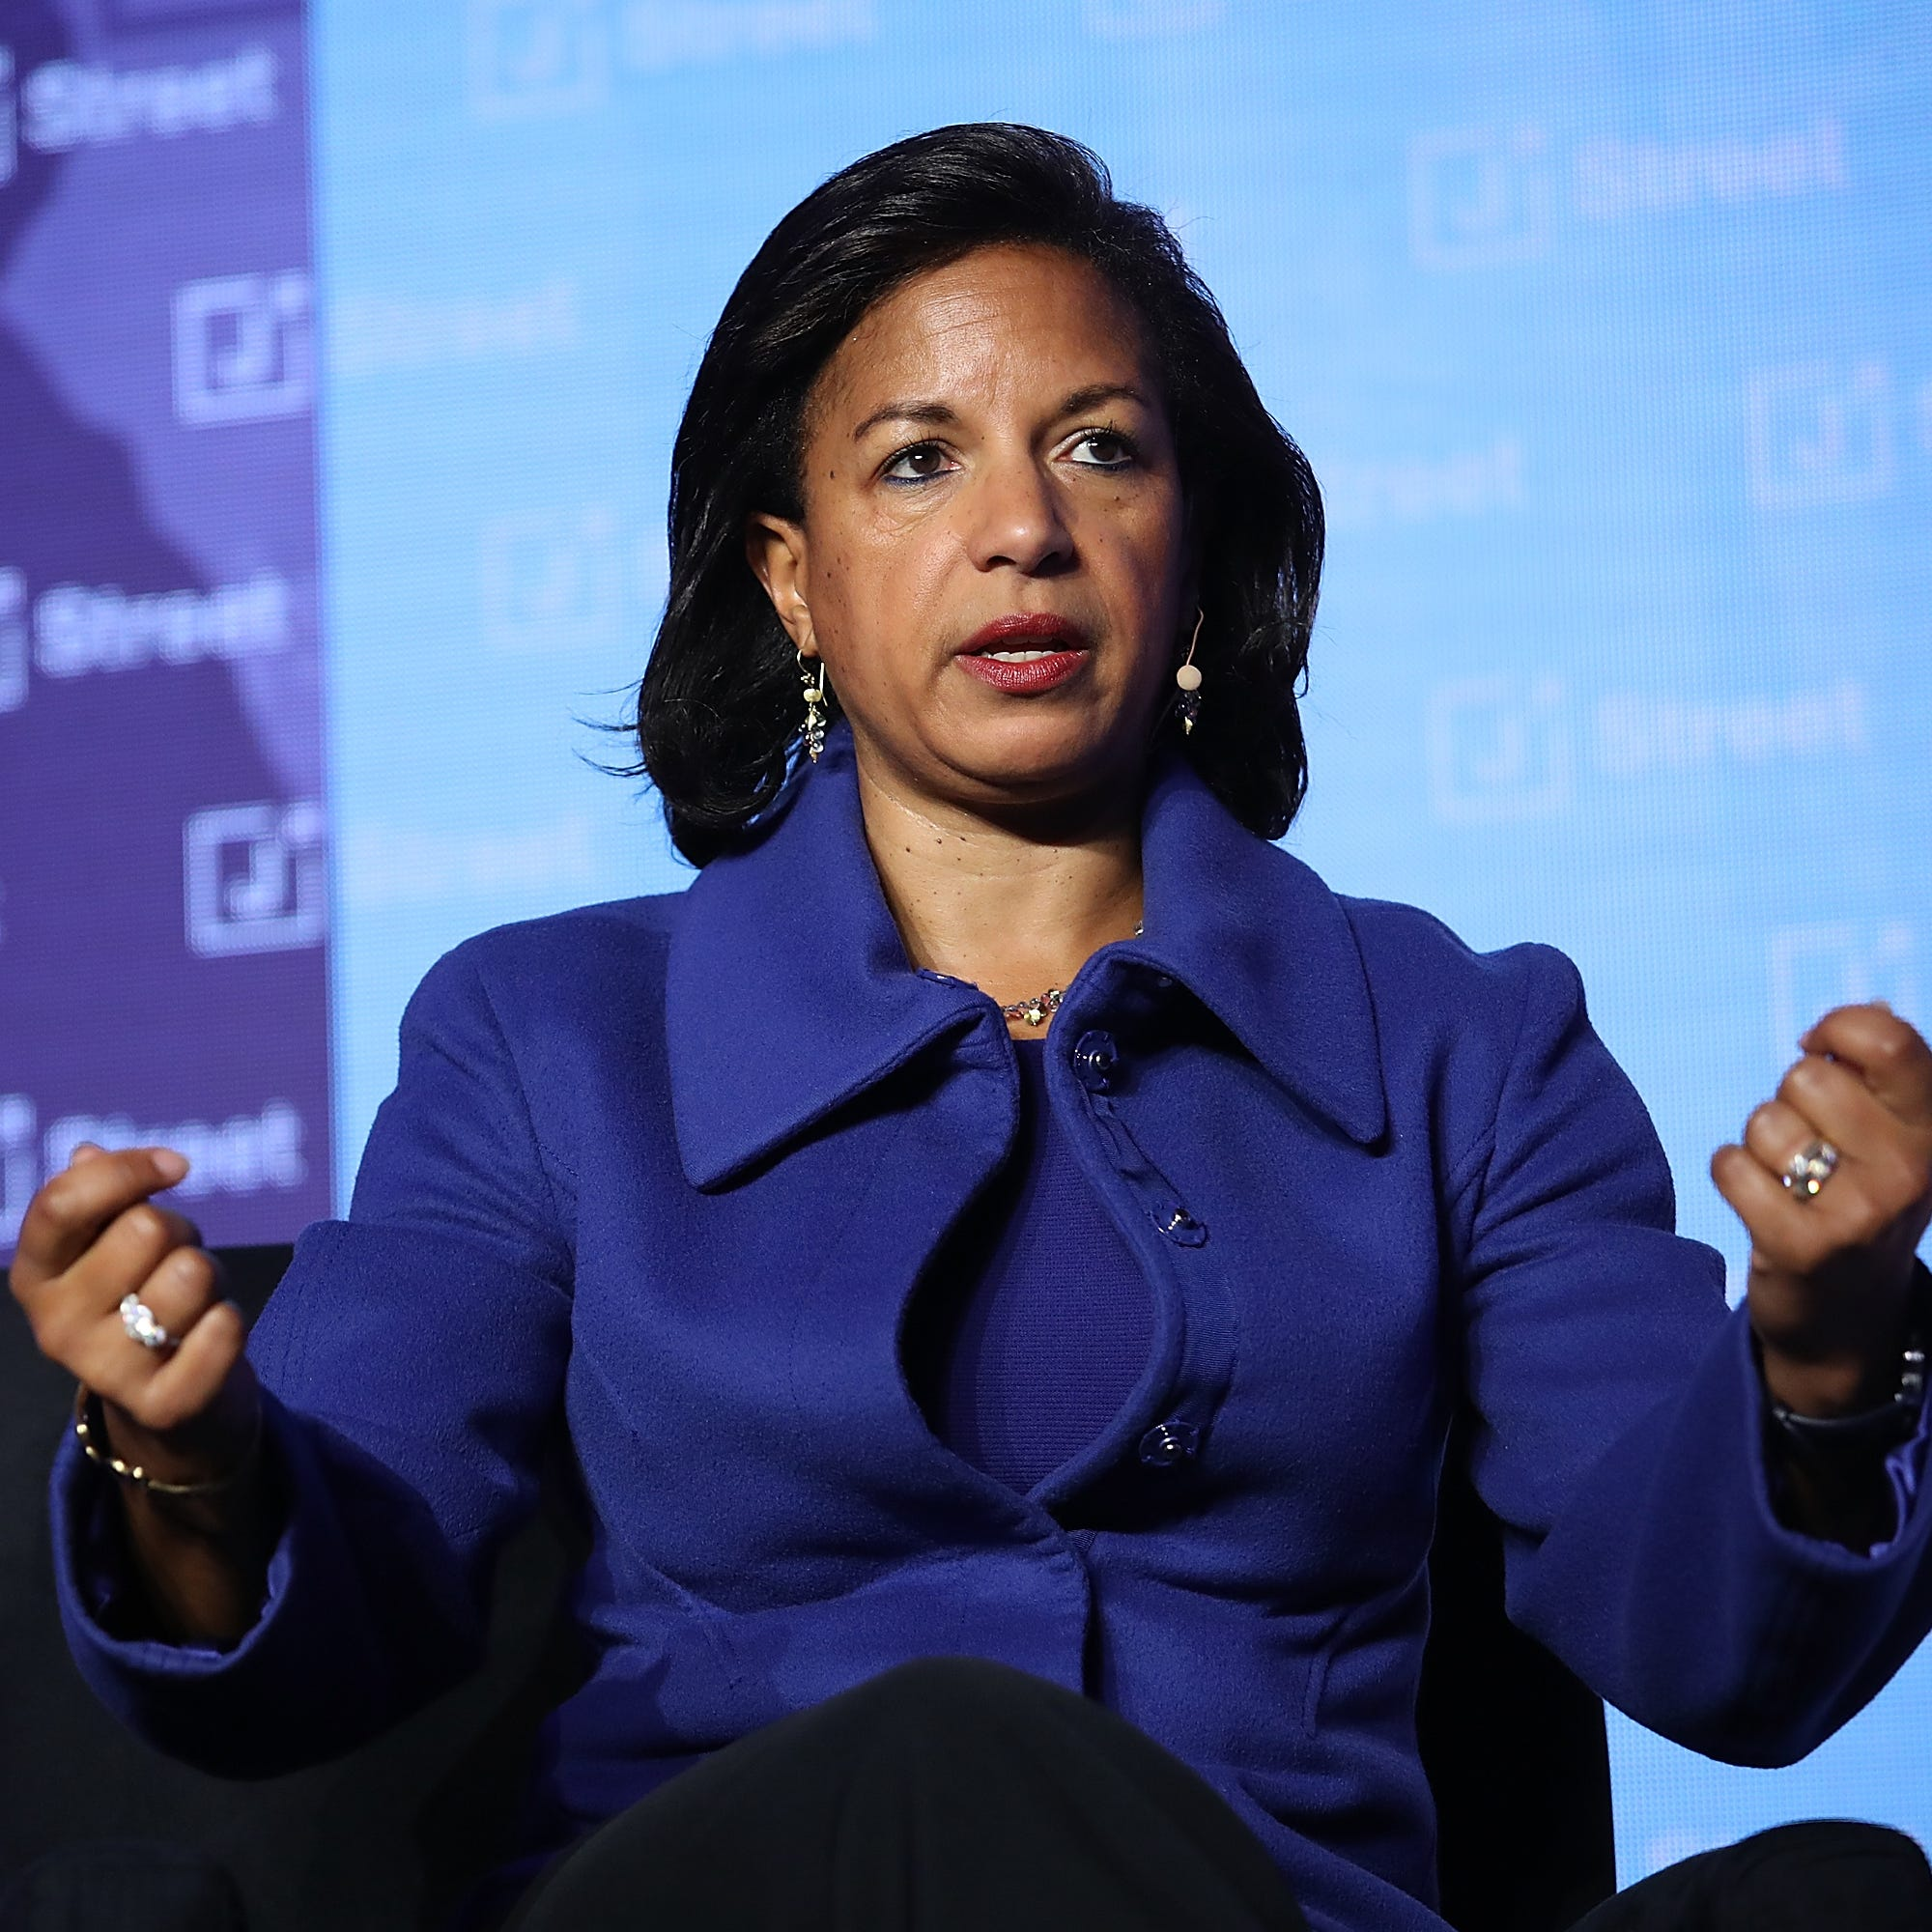 Former national security adviser Susan Rice speaks at the J Street 2018 National Conference on April 16, 2018 in Washington.